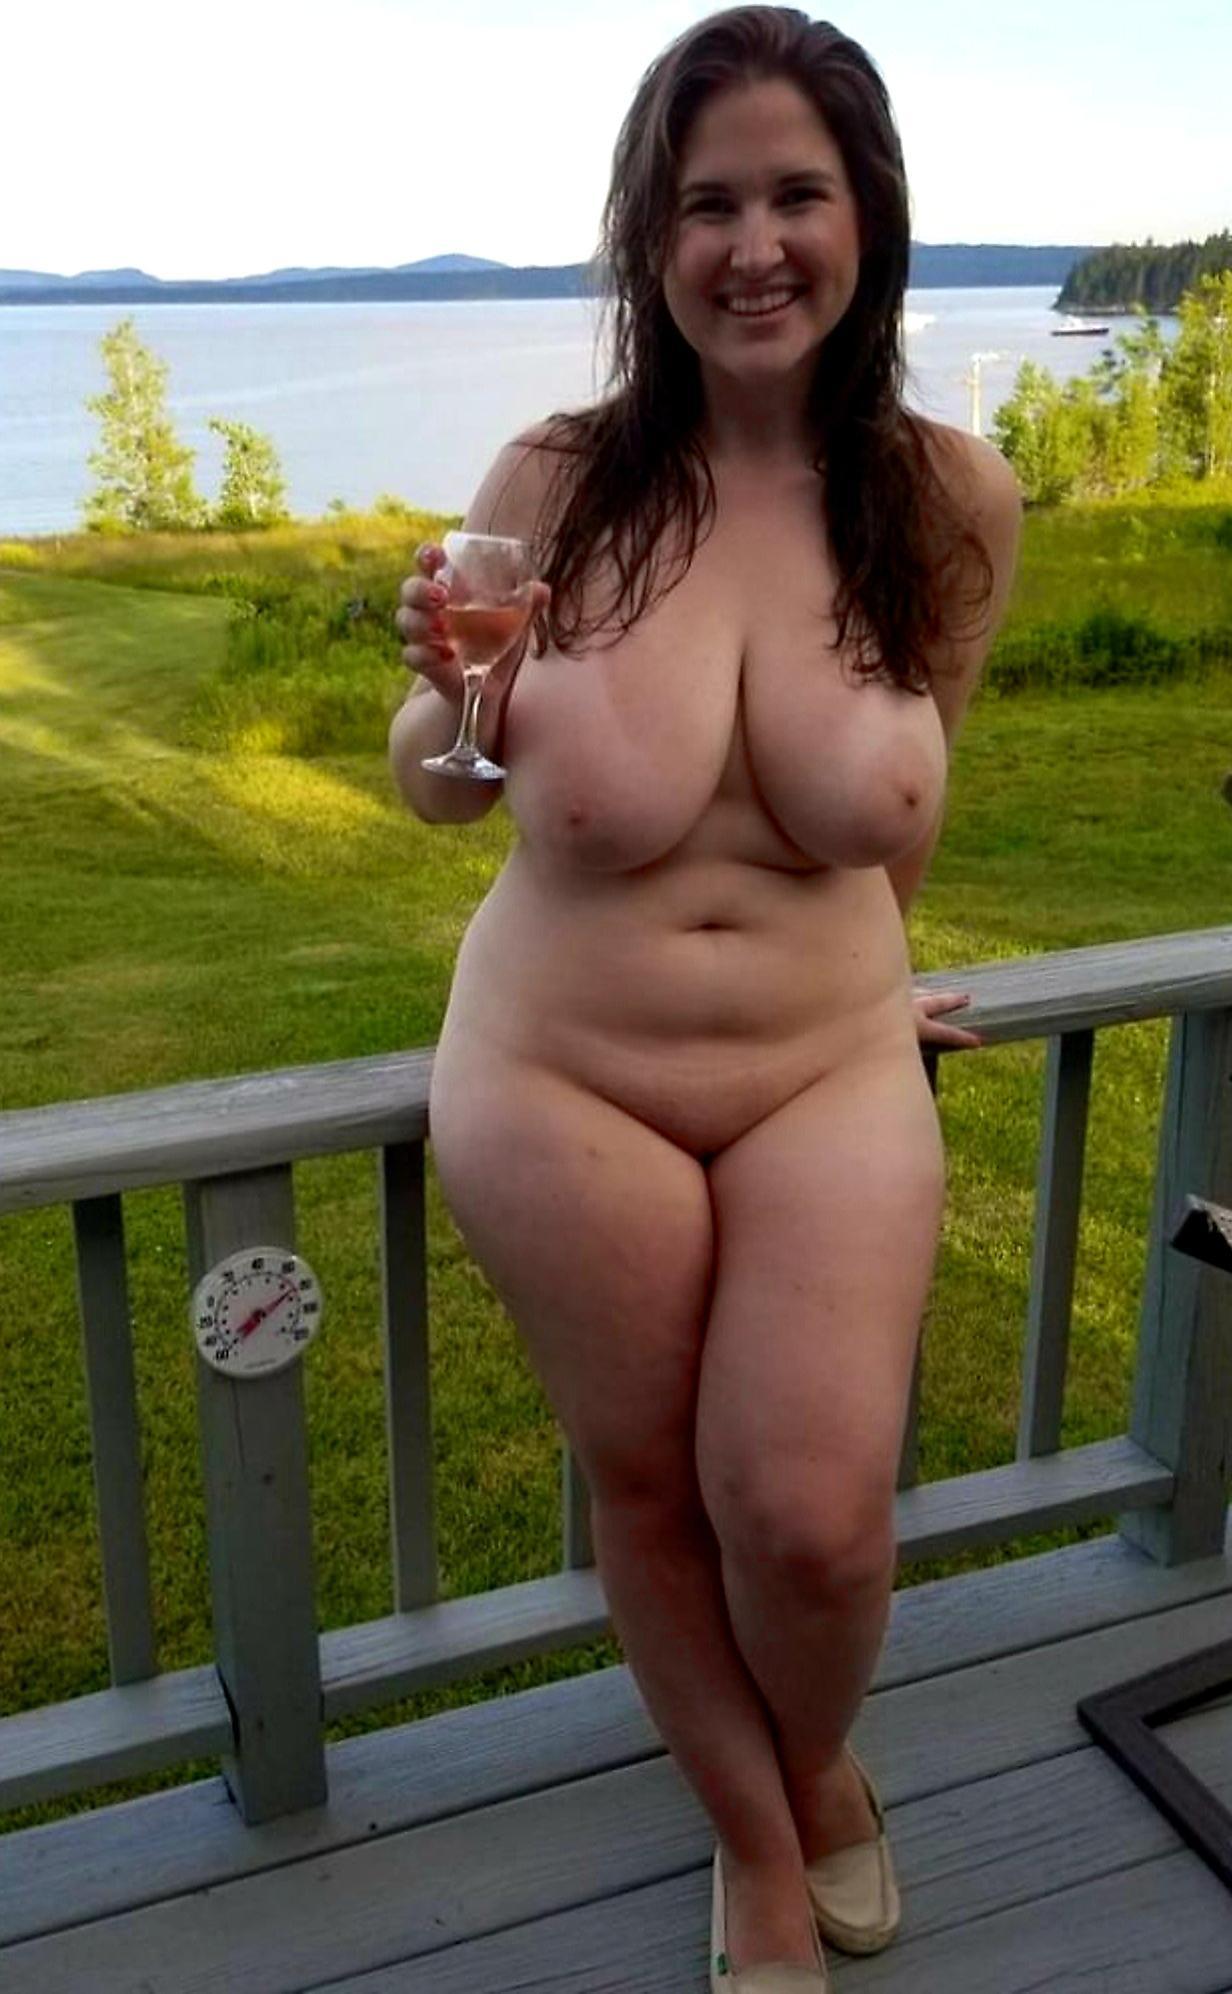 Blonde slut naked selfie mirrorshot mirrorshot selfie blonde nude naked sexy curvy